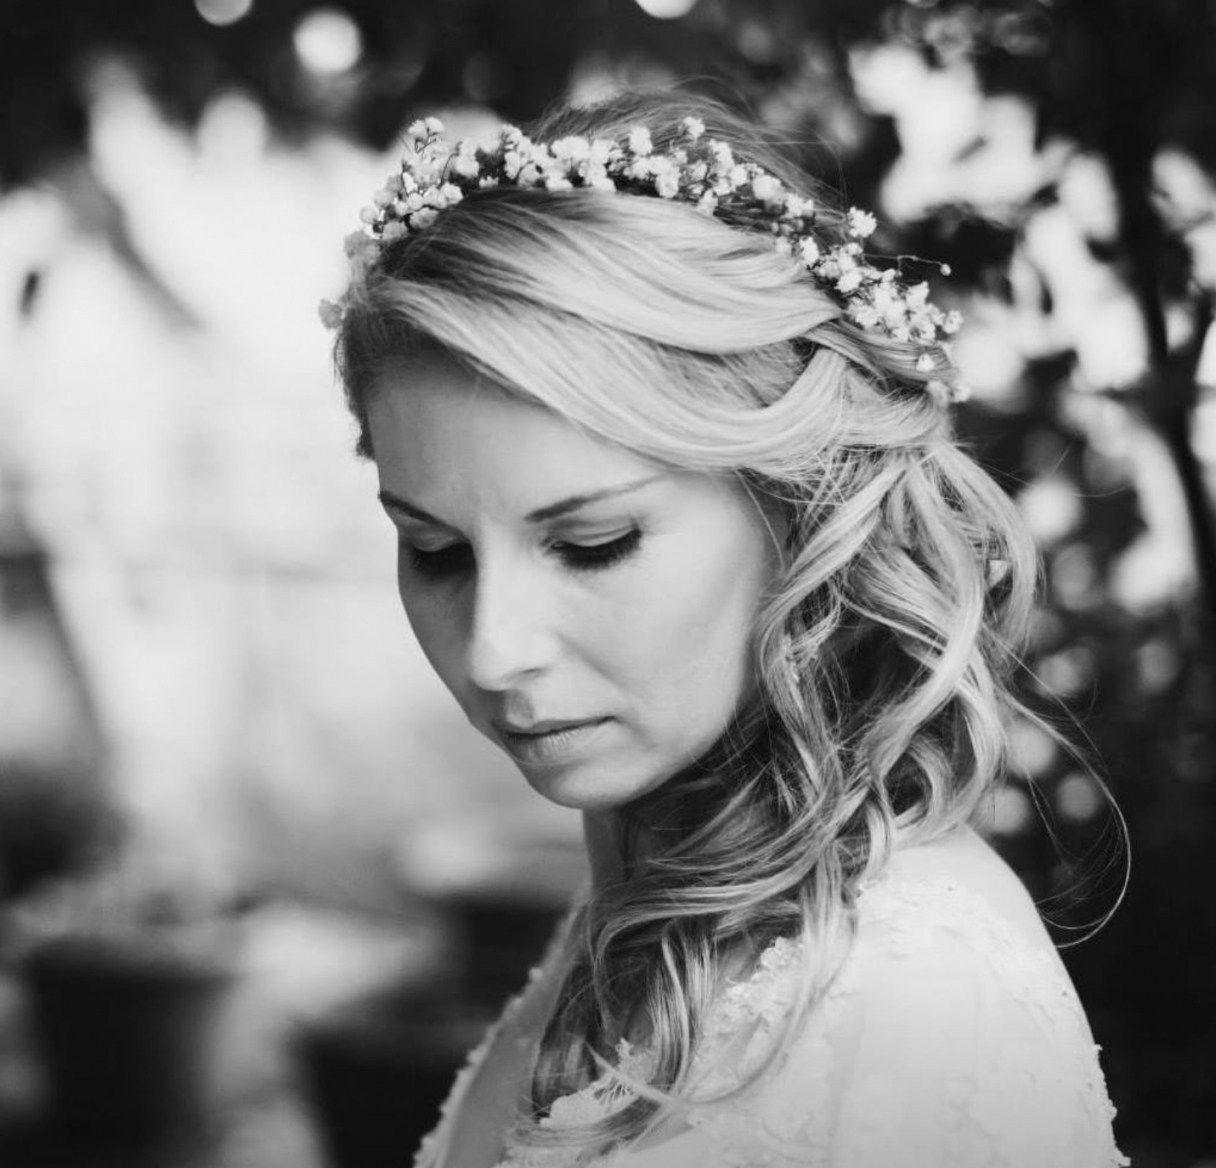 wedding hair prices belfast | hair and beauty ideas | pinterest